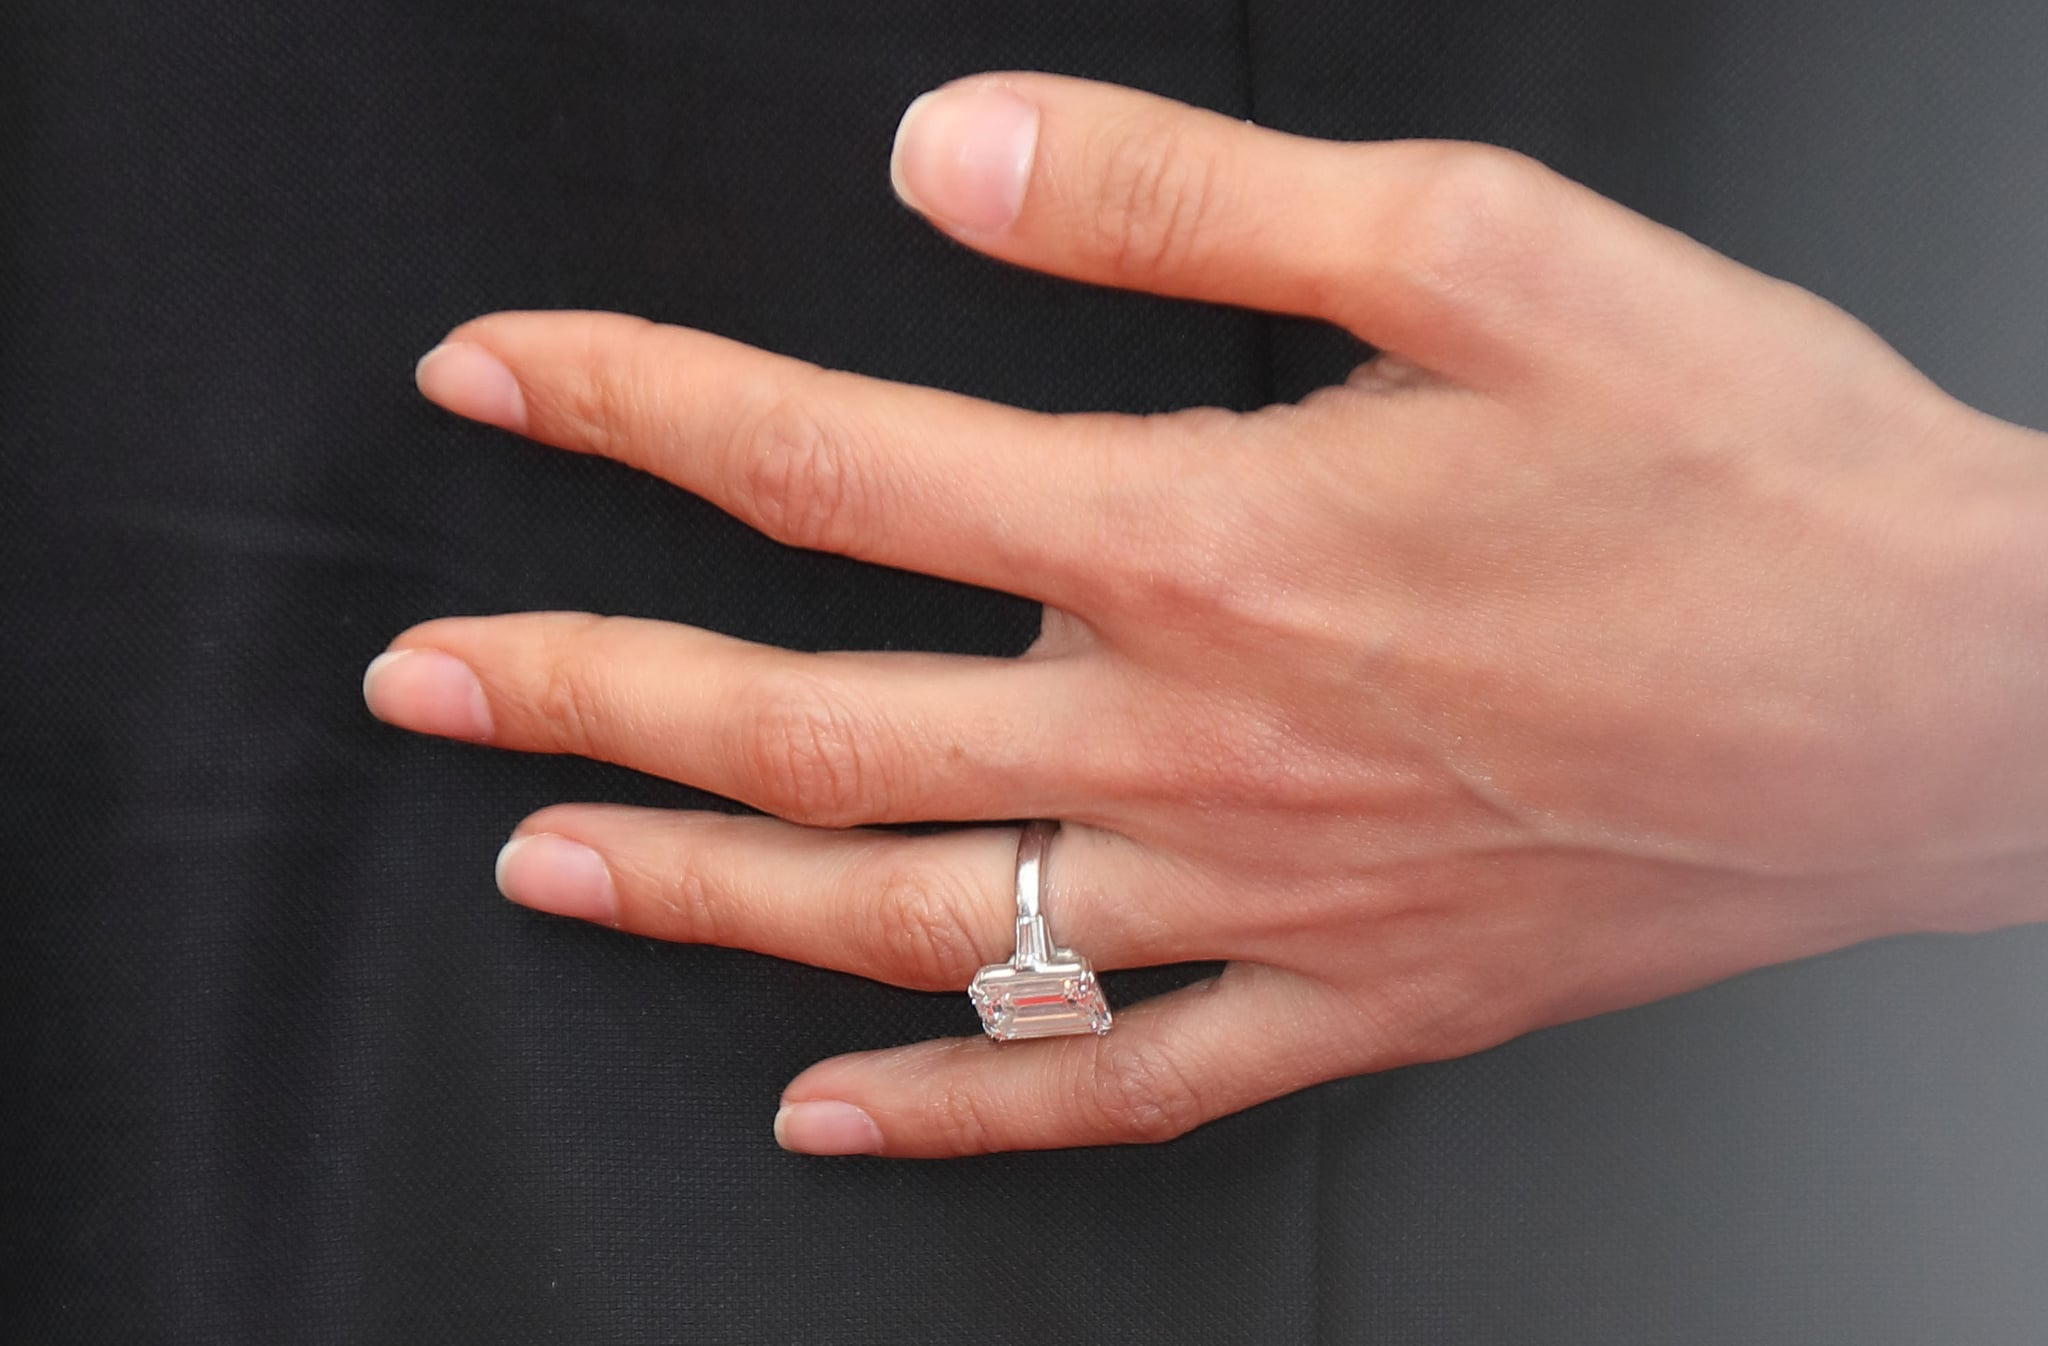 Amal-Clooney-Engagement-Ring